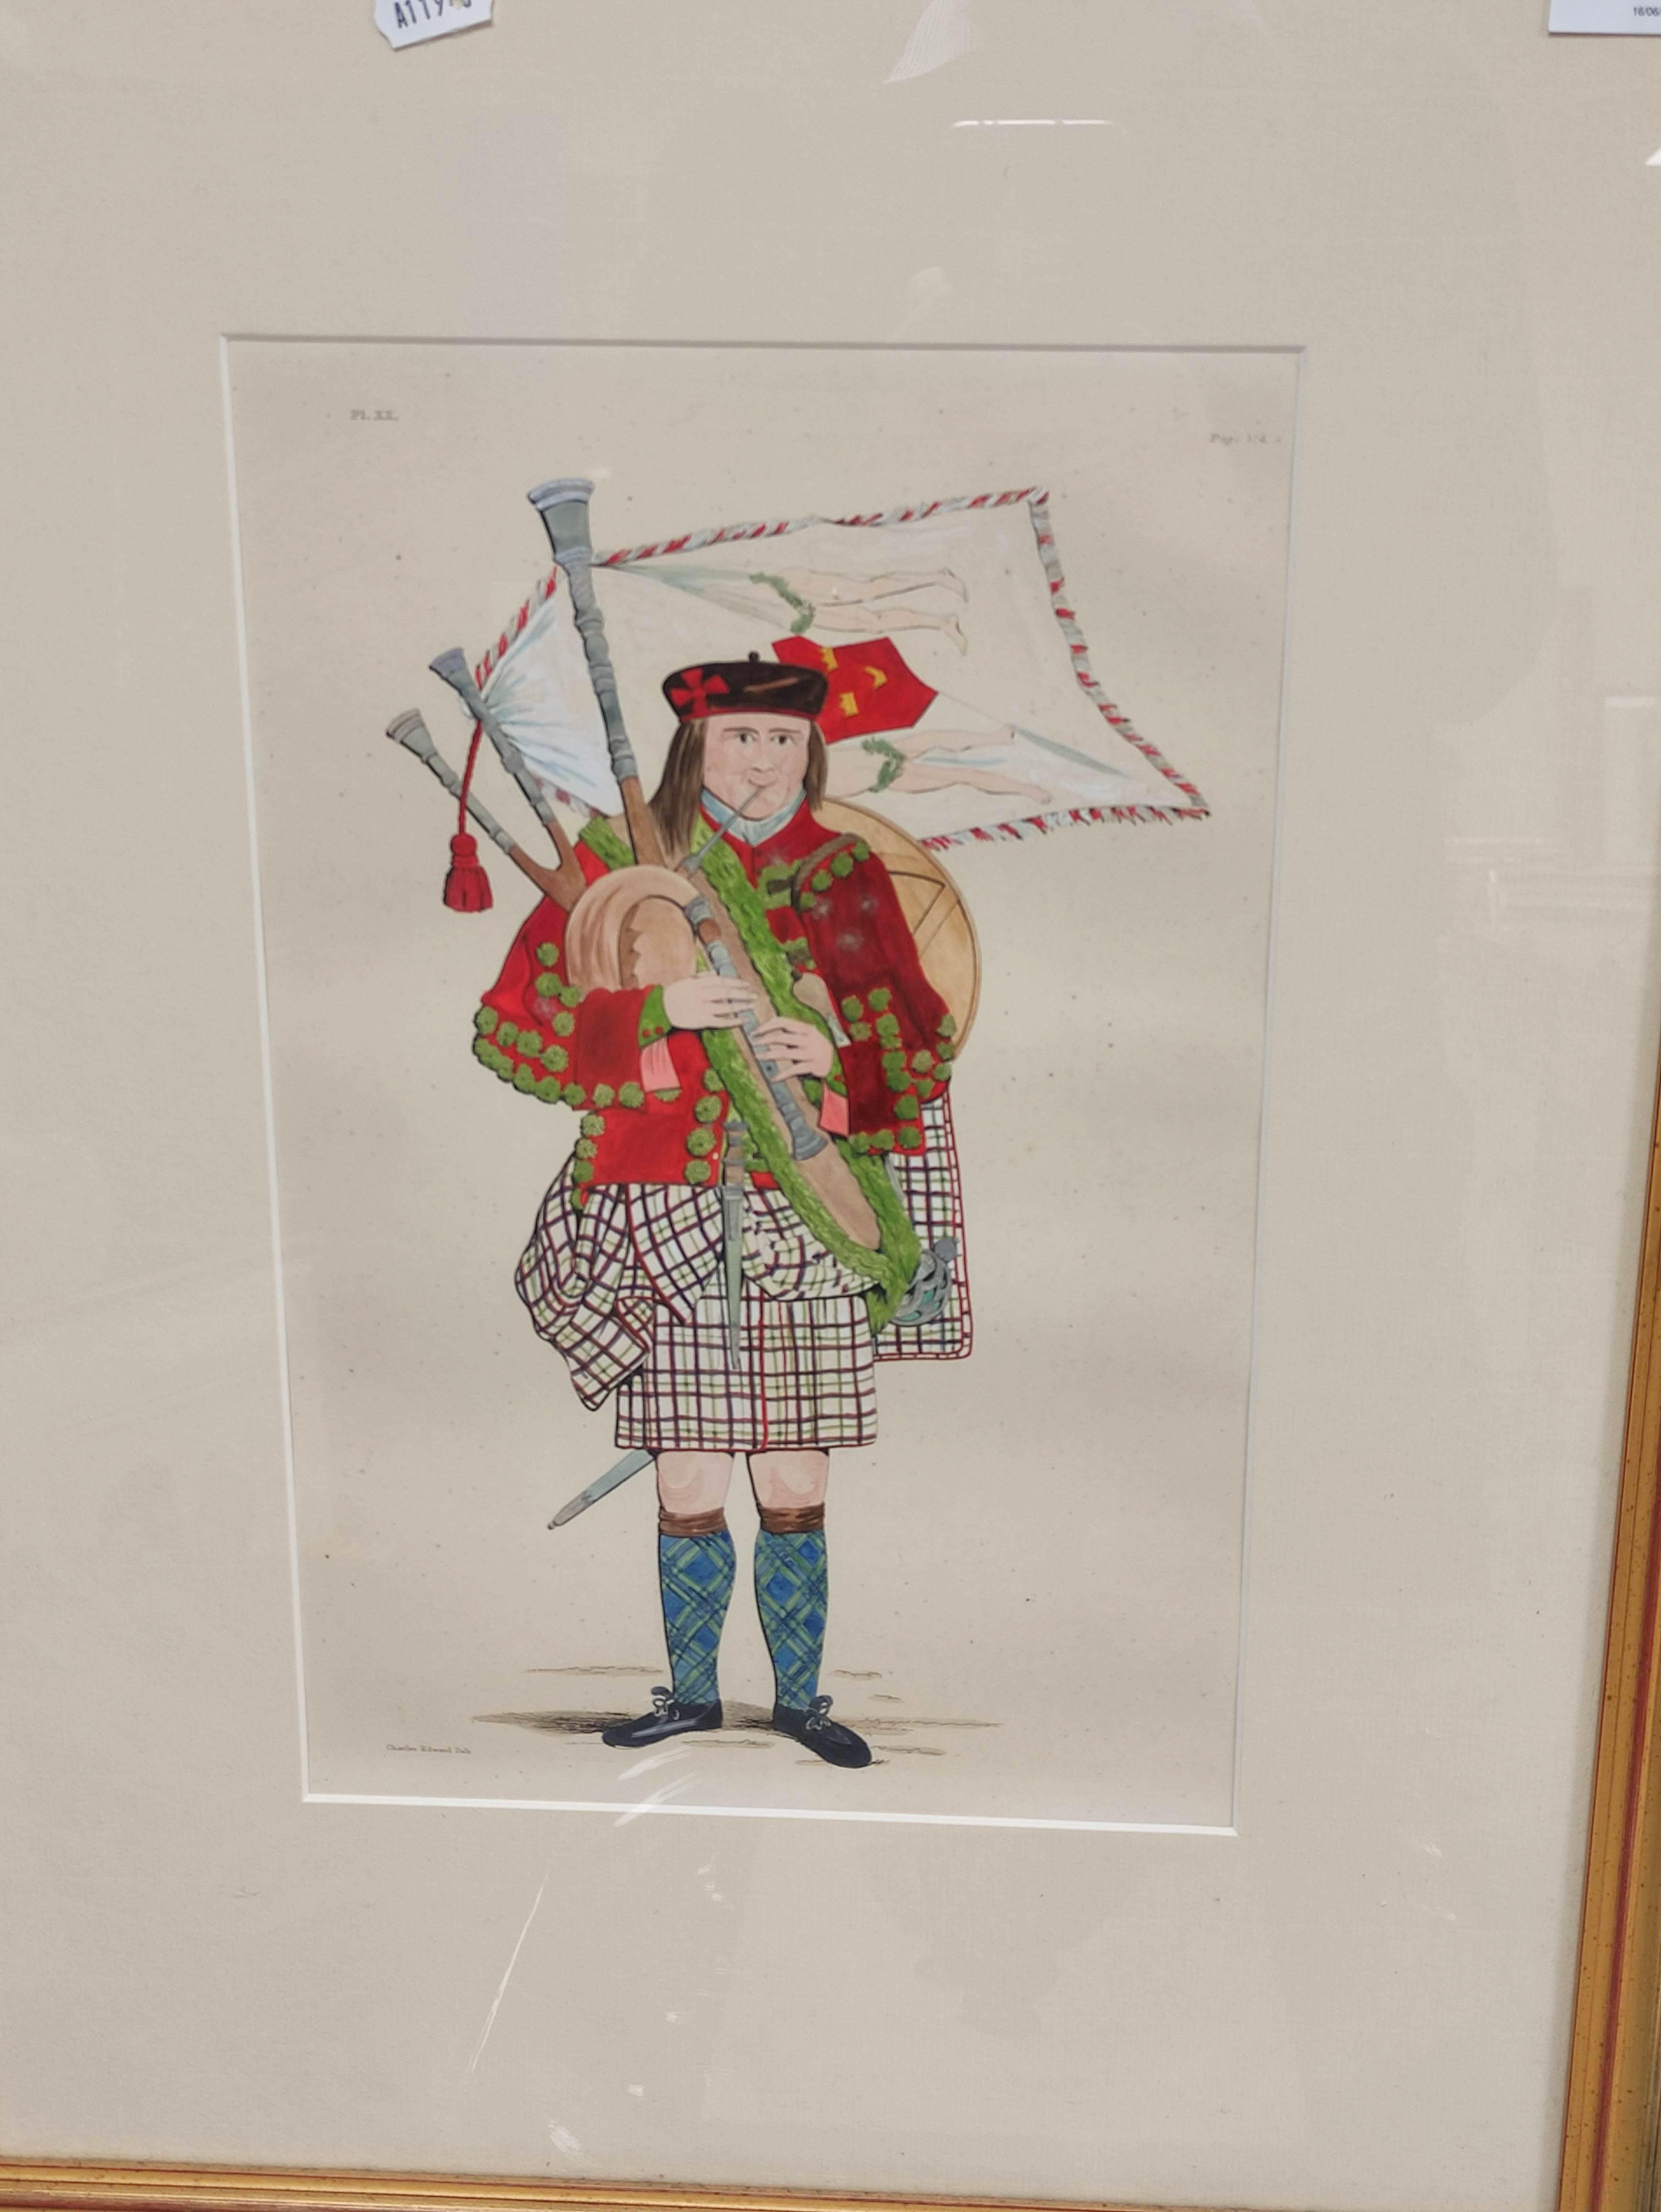 Highland Costume.4 hand coloured engraved plates, 2 framed. - Image 2 of 6